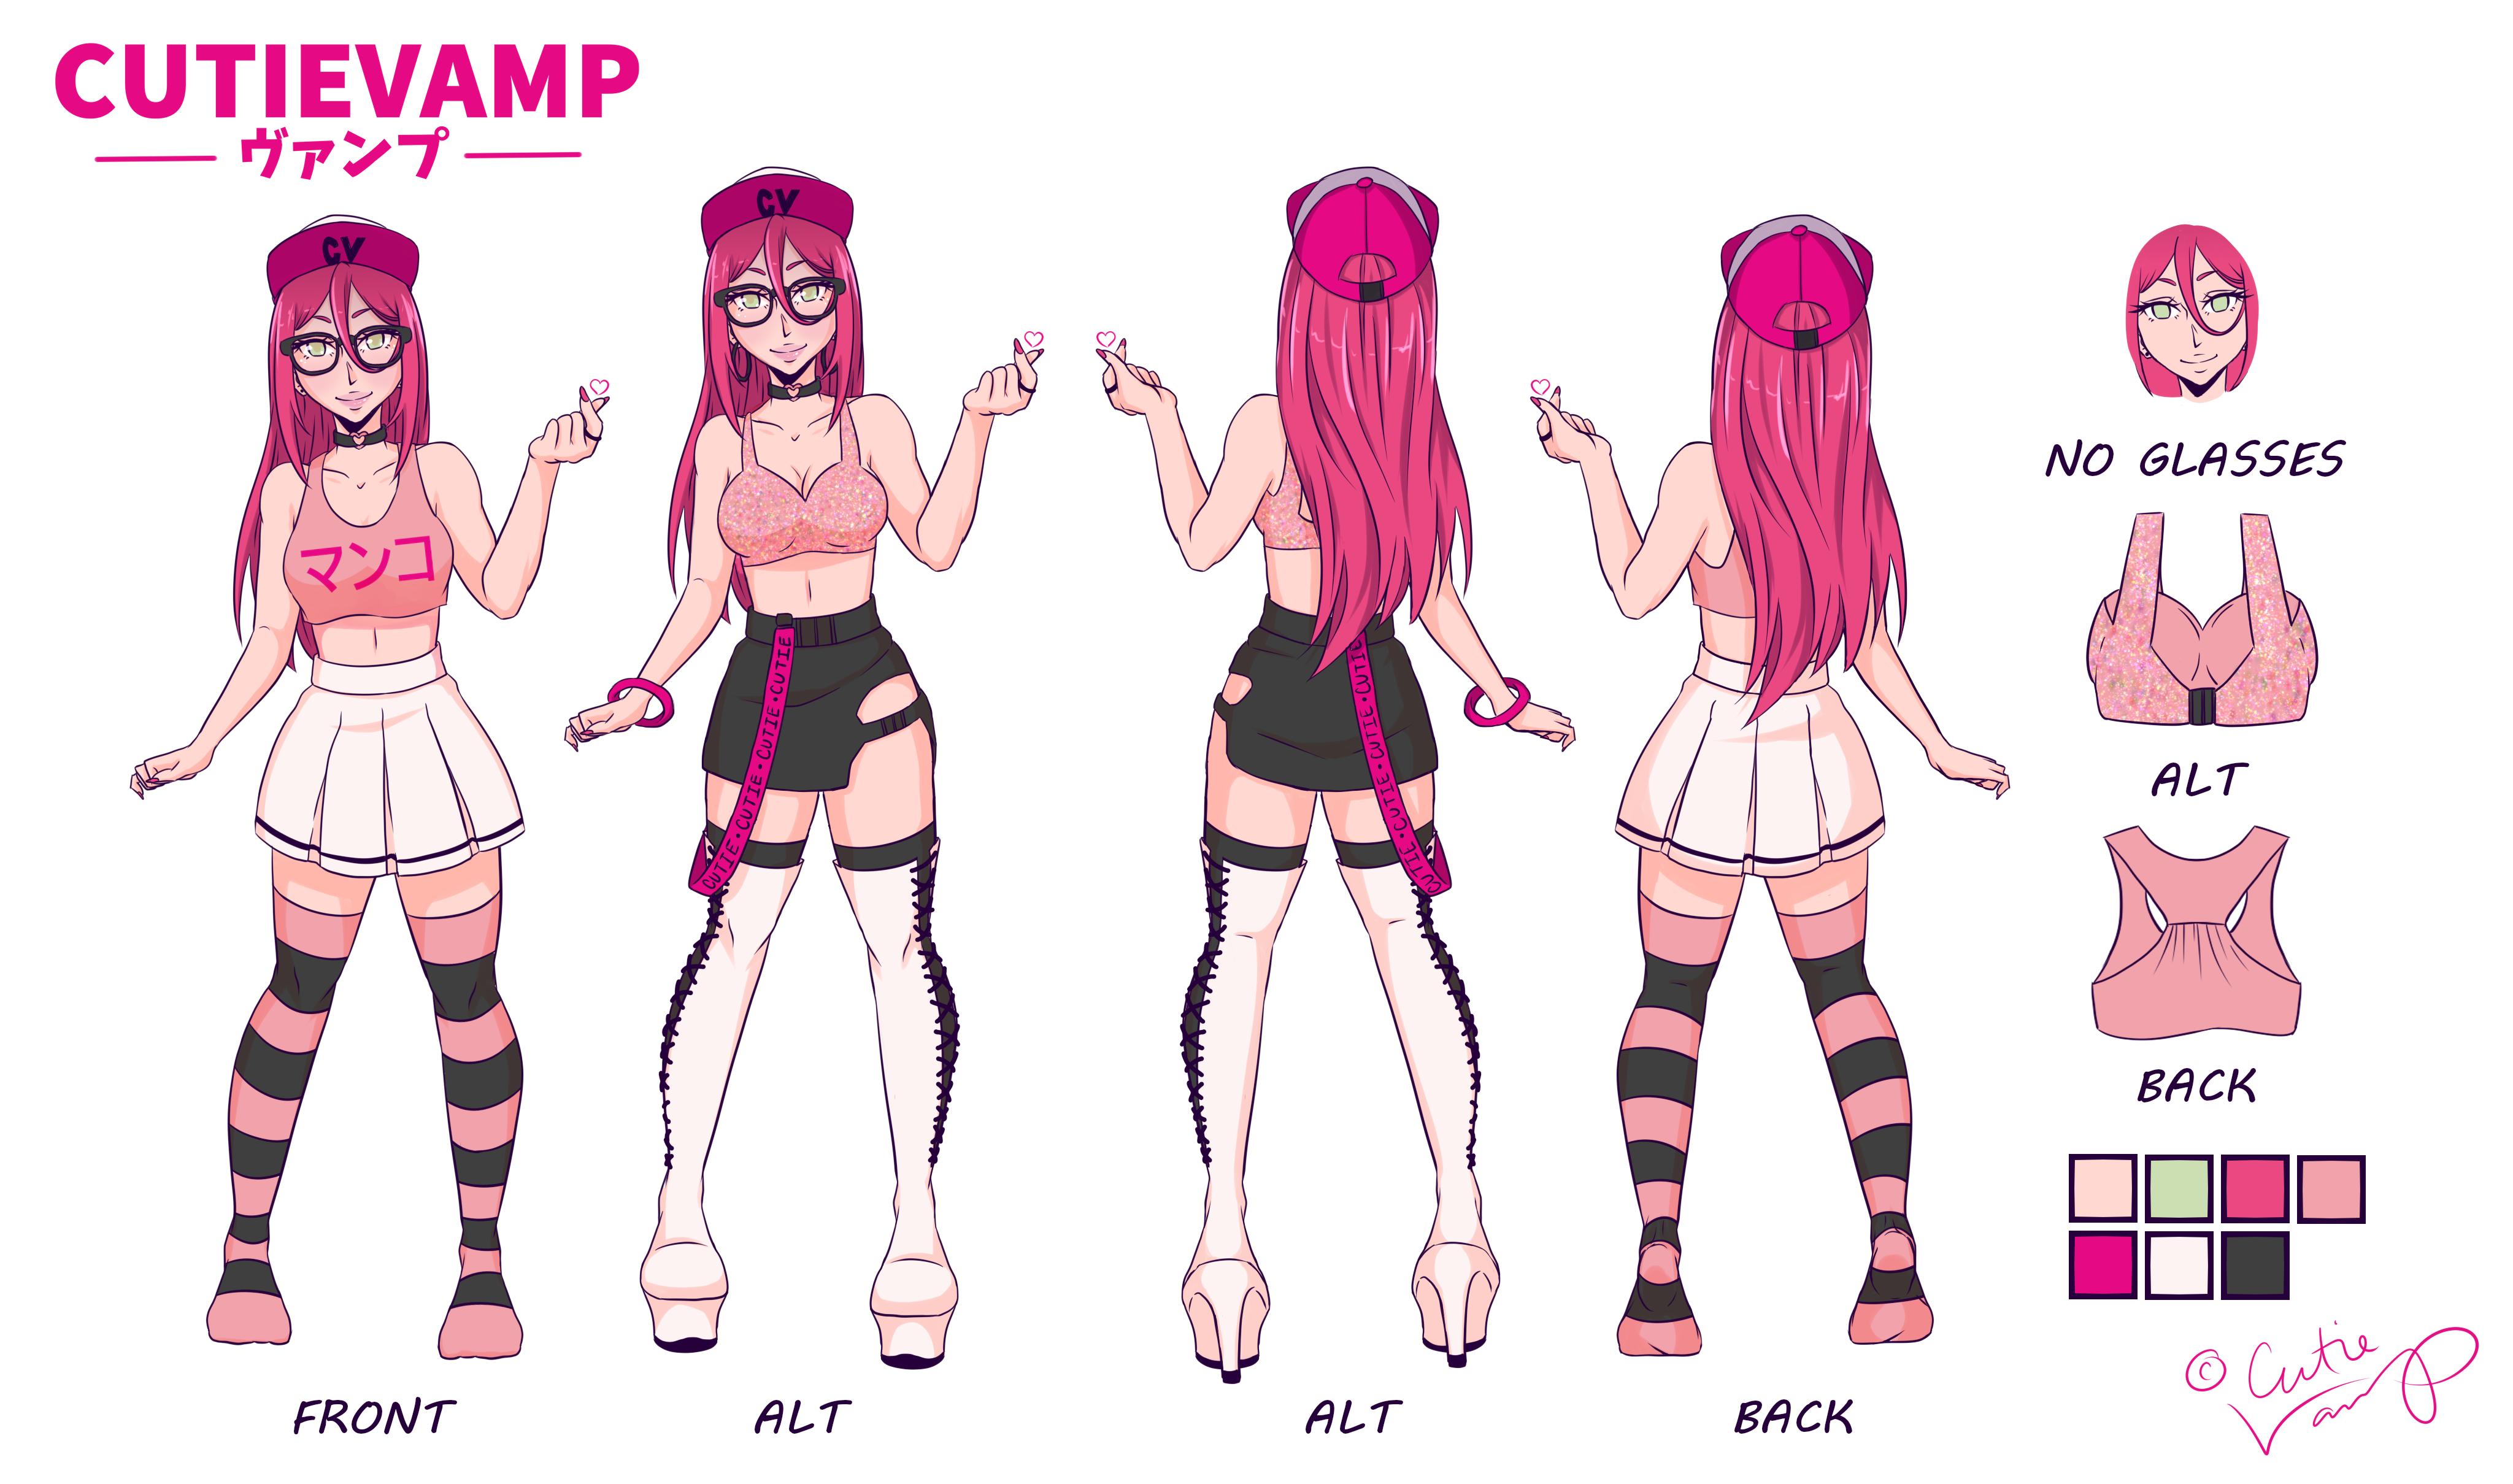 CutieVamp Reference Sheet